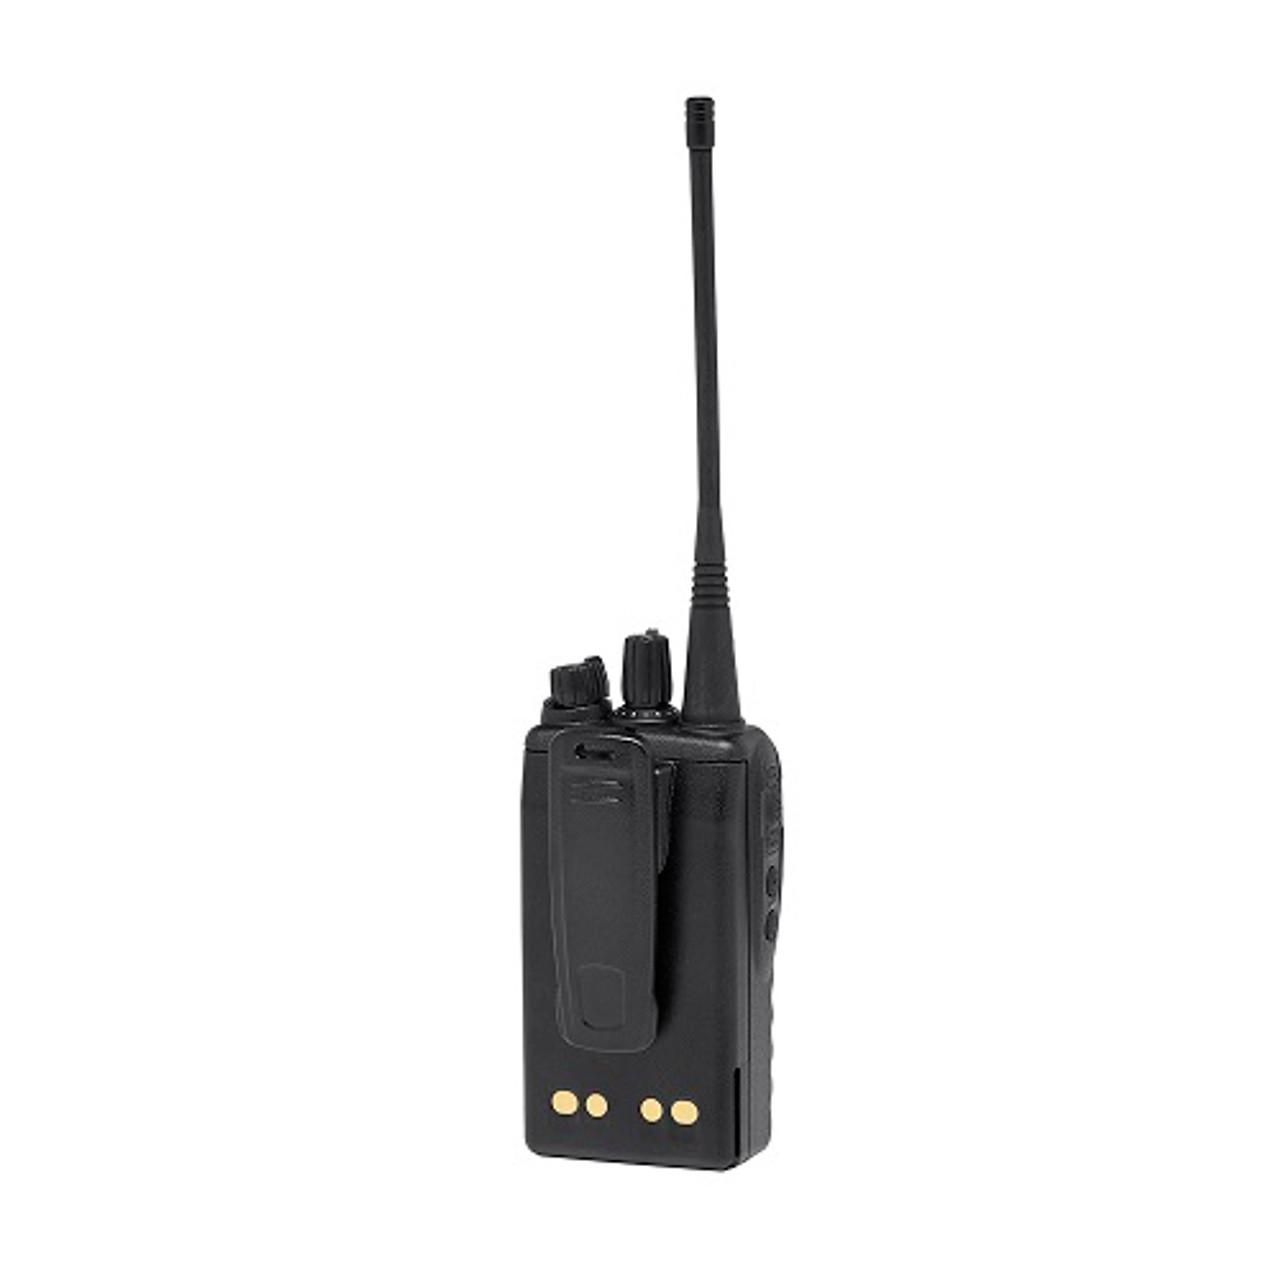 Motorola ISVX-459 Intrinsically Safe UHF 2 Way Radio